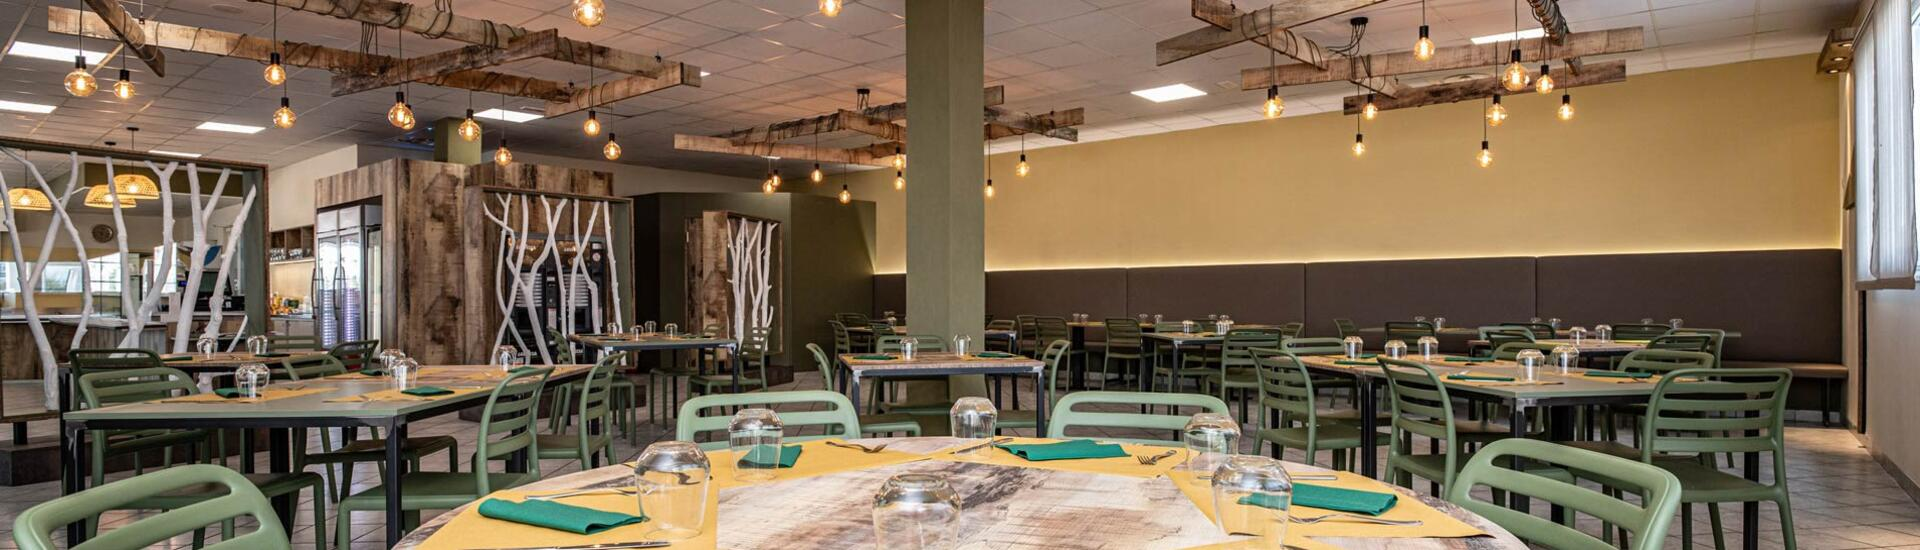 holidayfamilyvillage fr restaurant-shopping 011